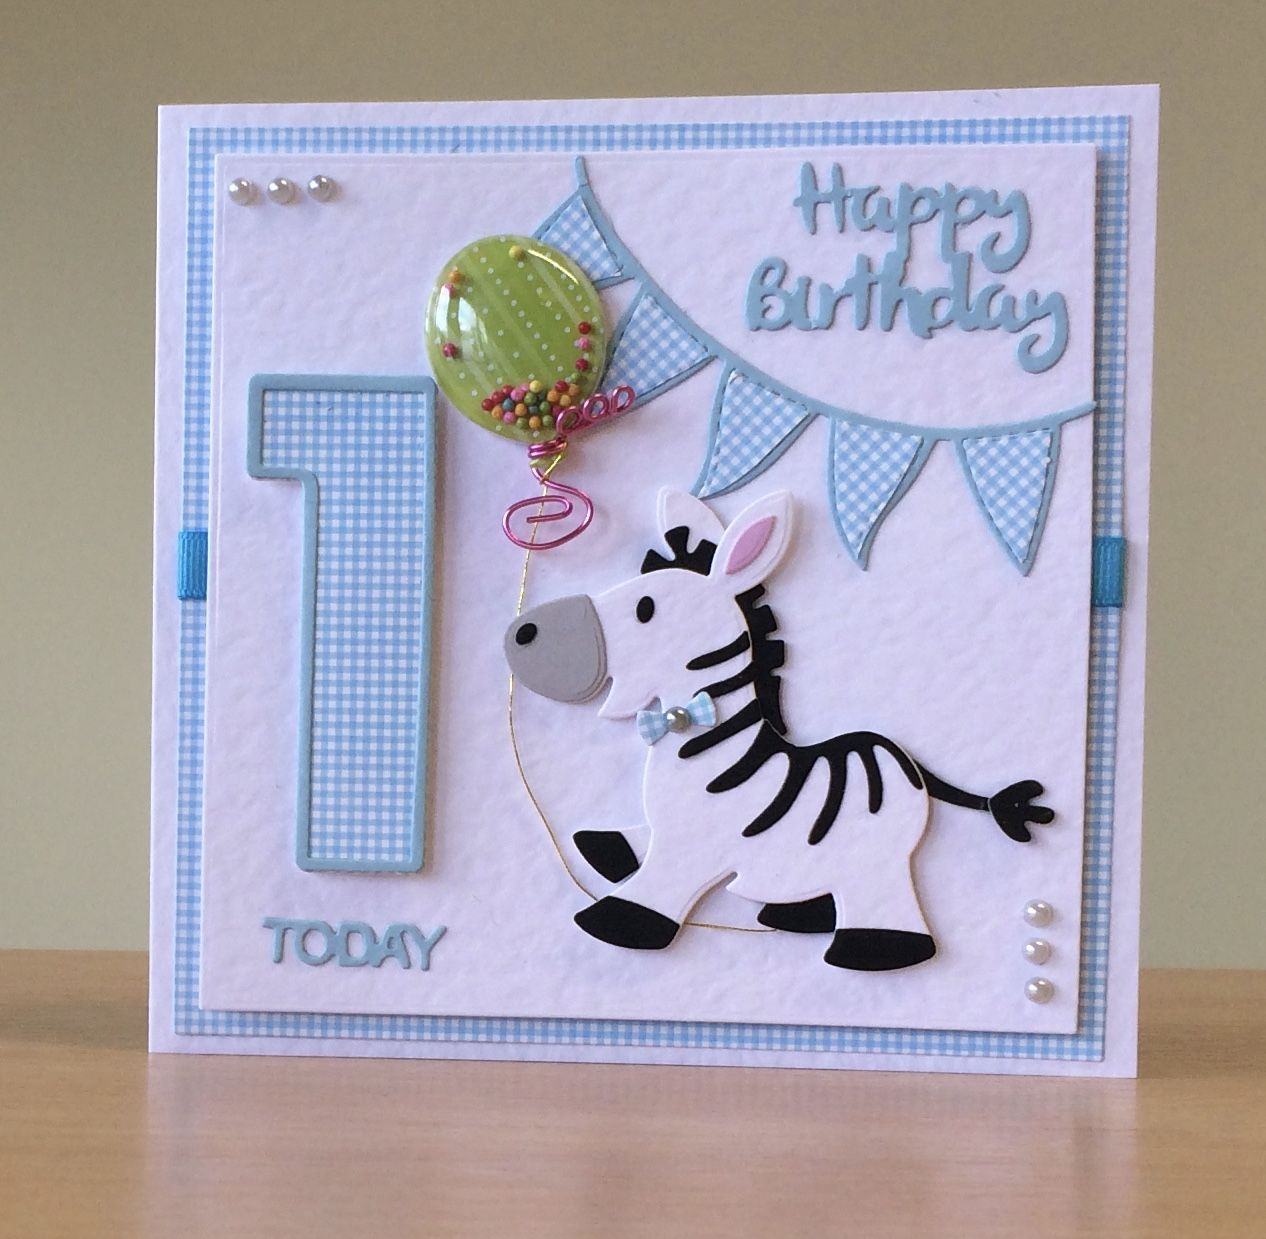 1st Birthday Card Handmade Marianne Zebra Die For More Of My Cards Please Visit Craftycardstudio On First Birthday Cards 1st Birthday Cards Cards Handmade